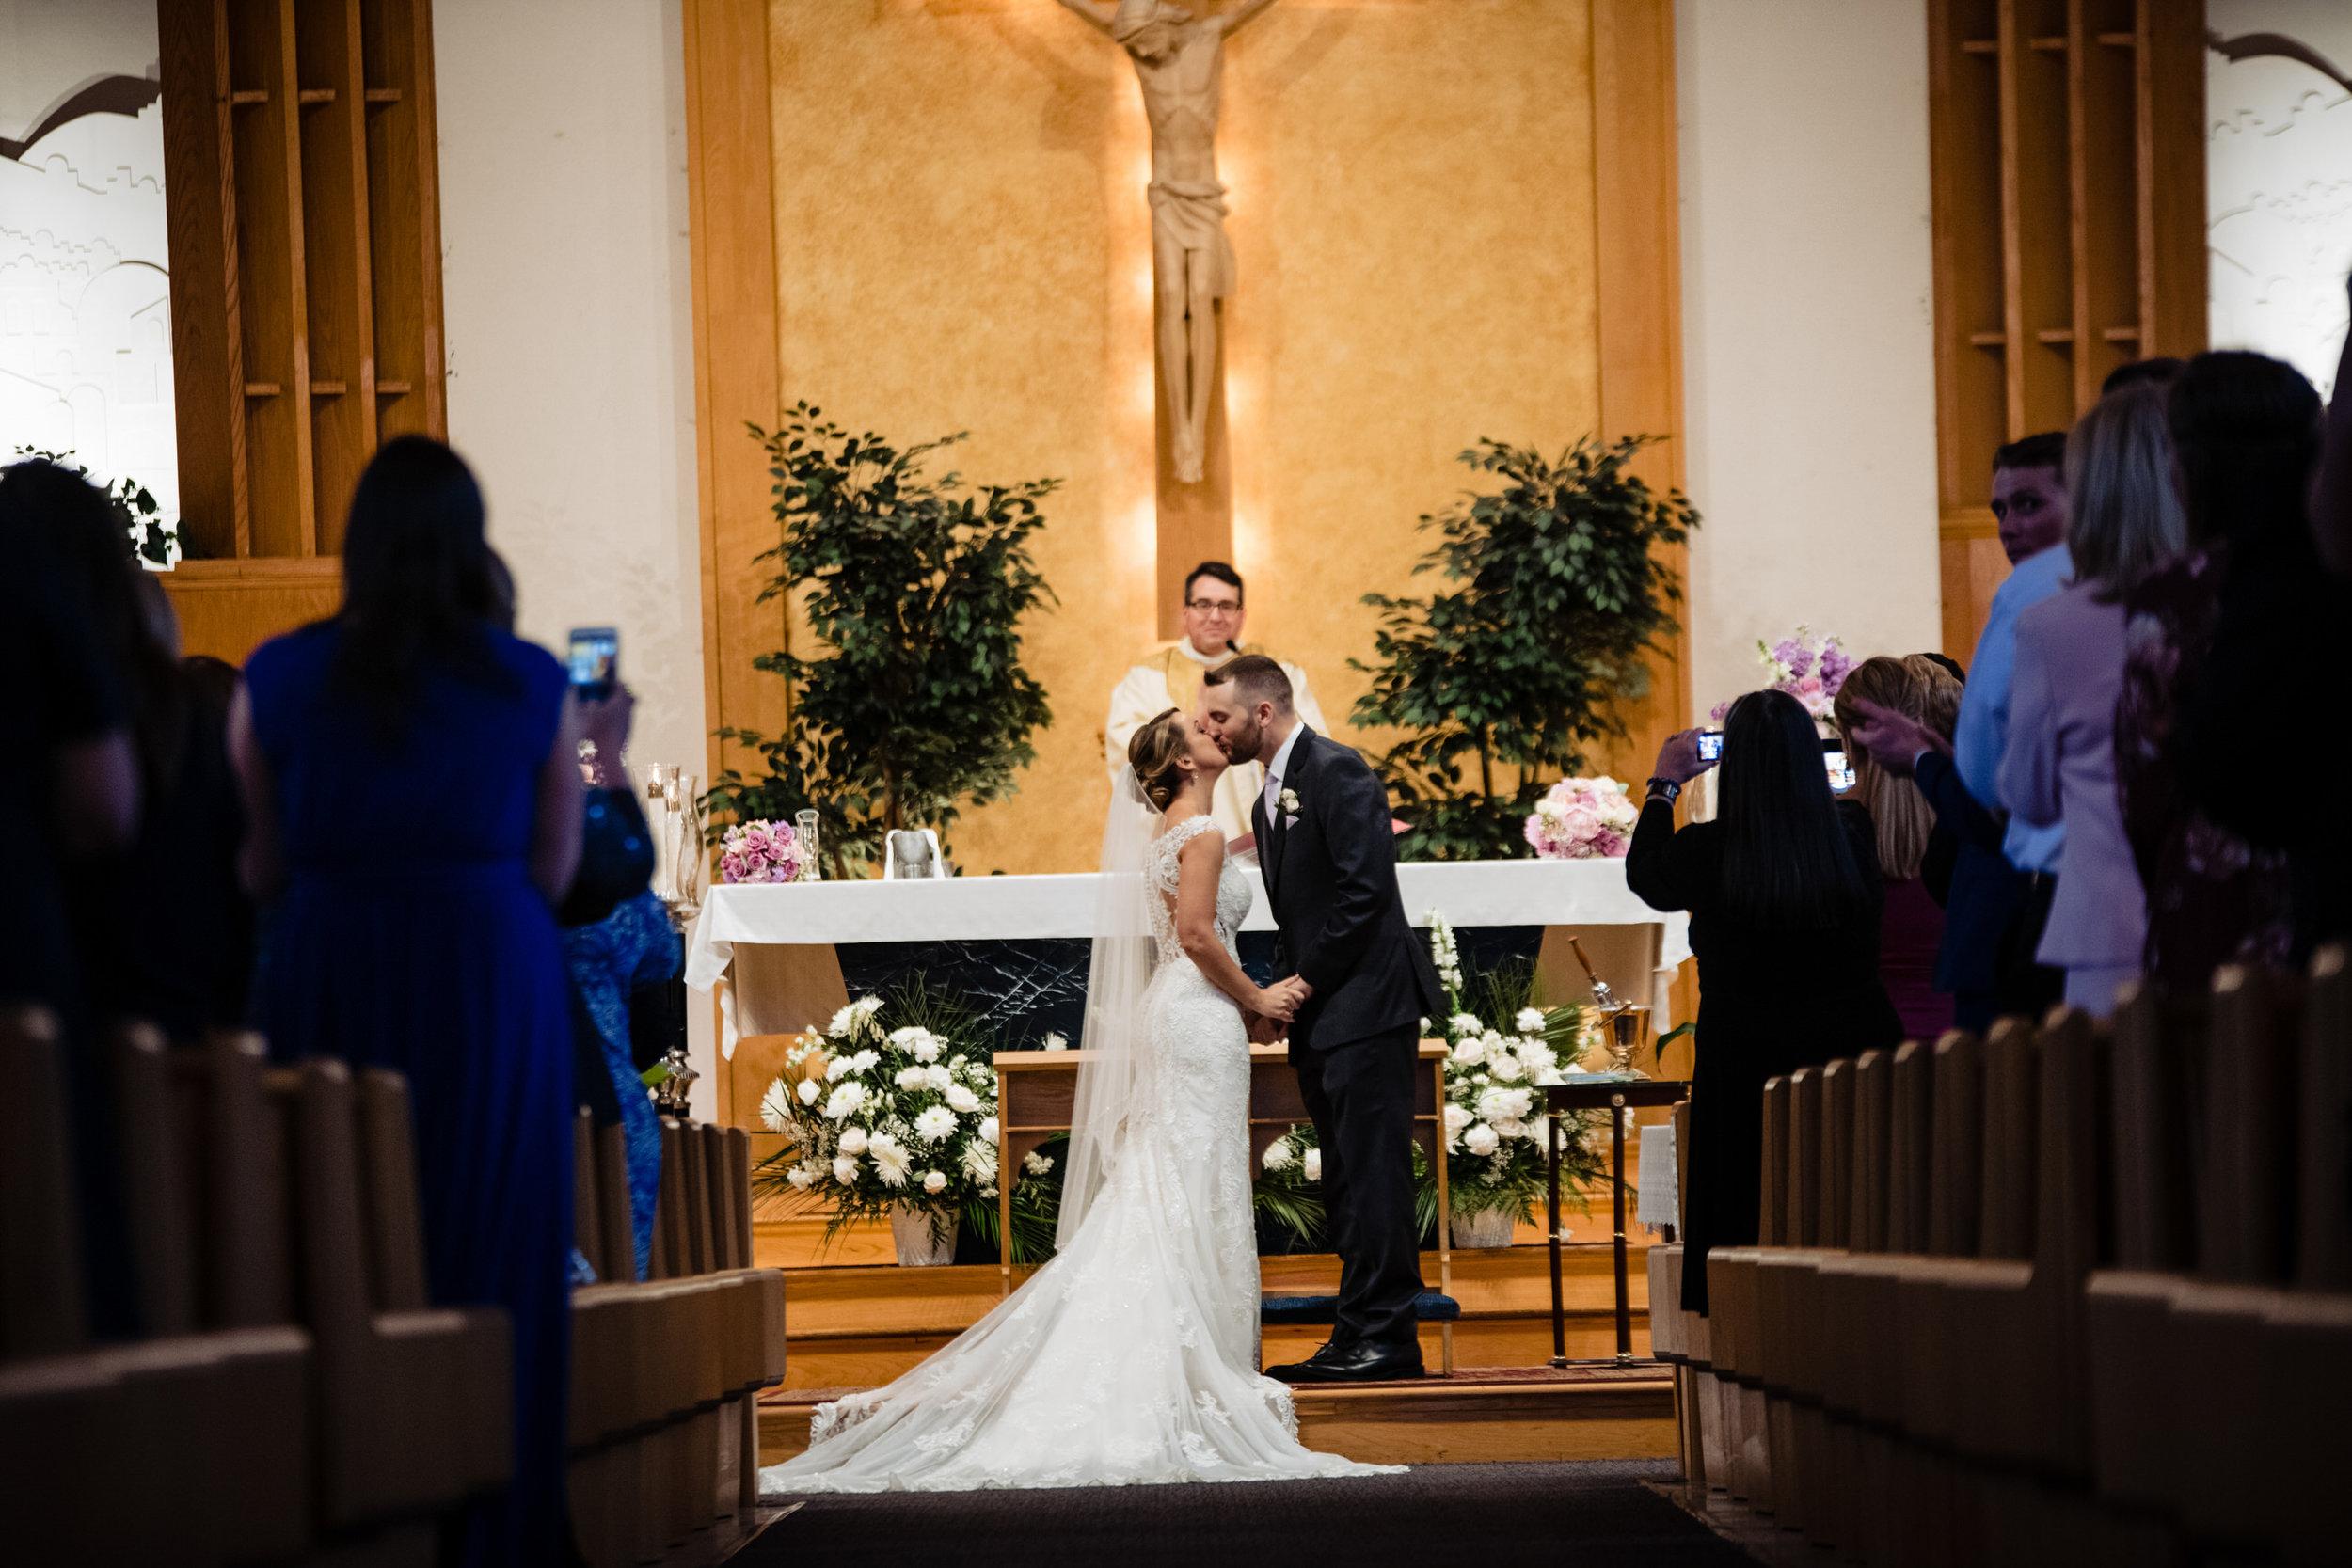 WarwickCountryClubWedding-Lauren&Alex-Ceremony-0941.jpg